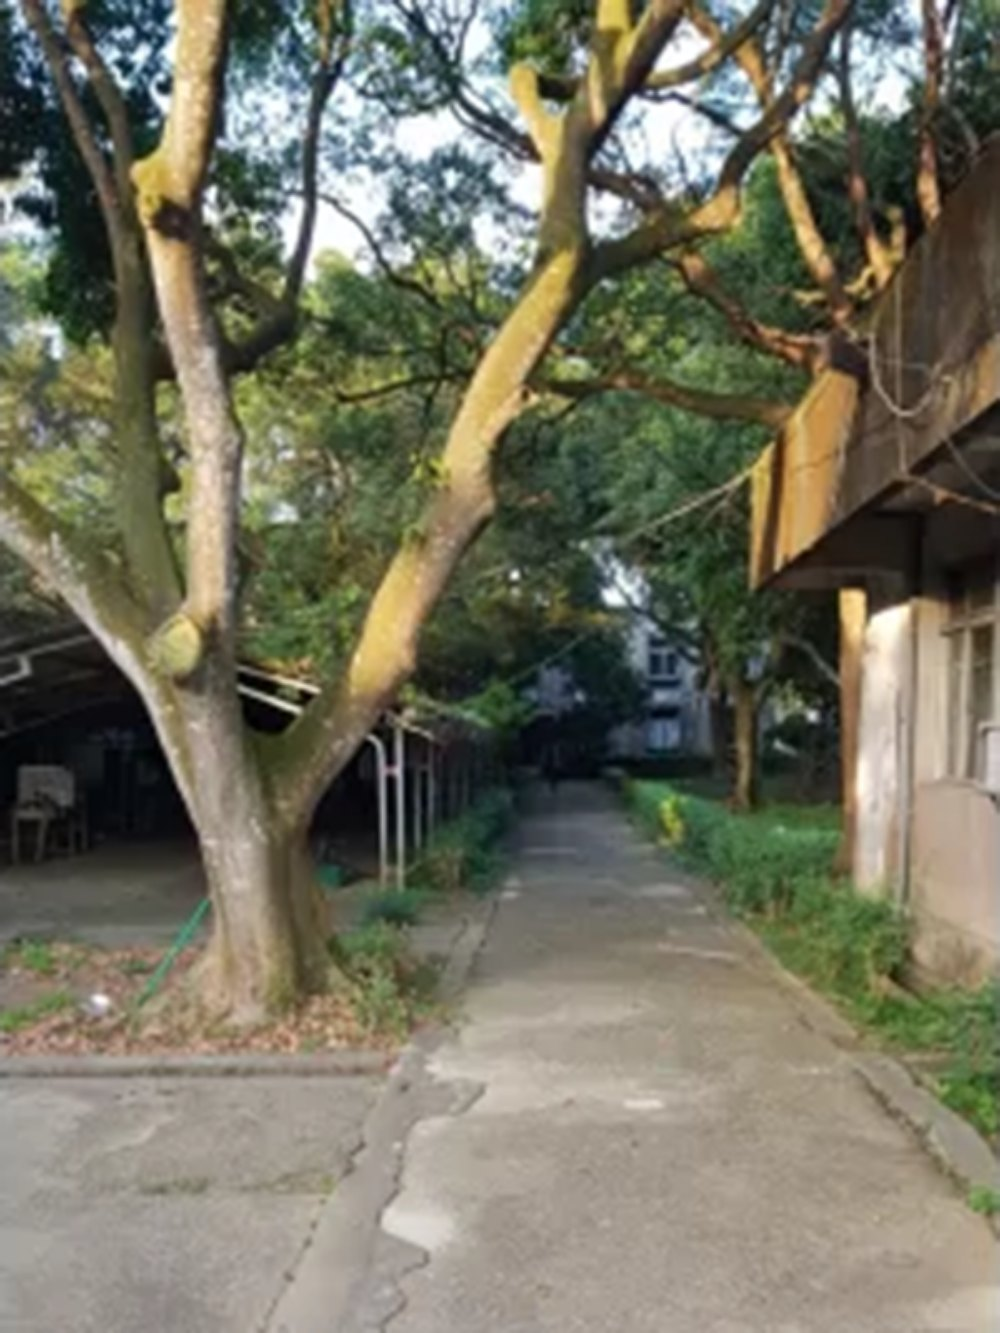 A4623-龍潭高楊第二交流道丁建工業地-09